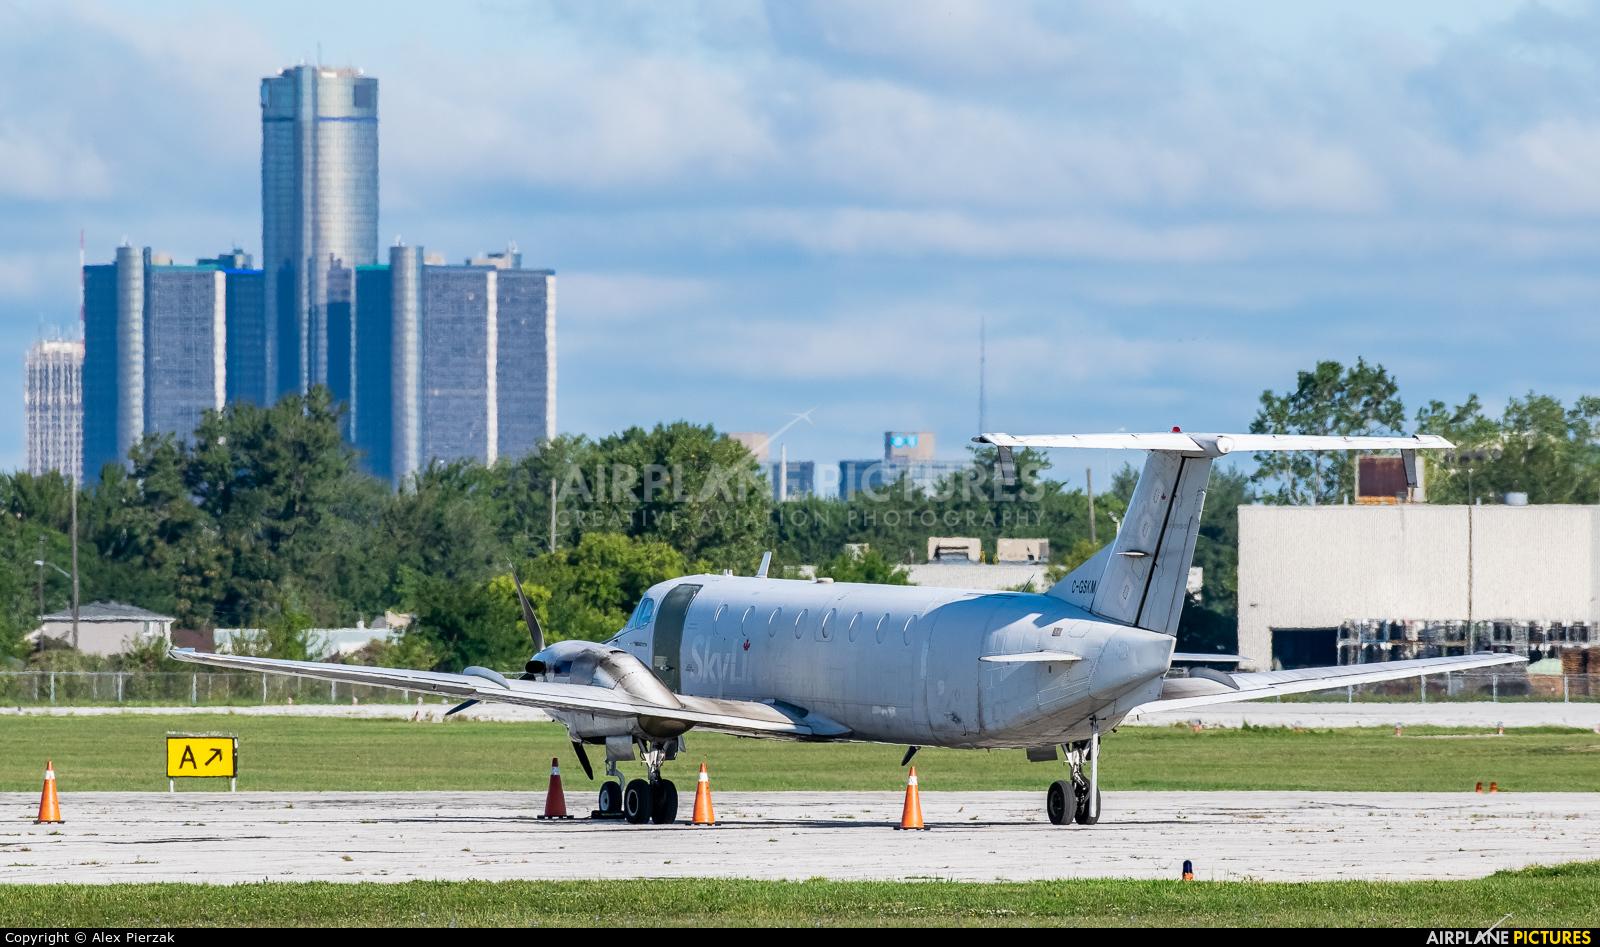 Skylink C-GSKM aircraft at Windsor, ON